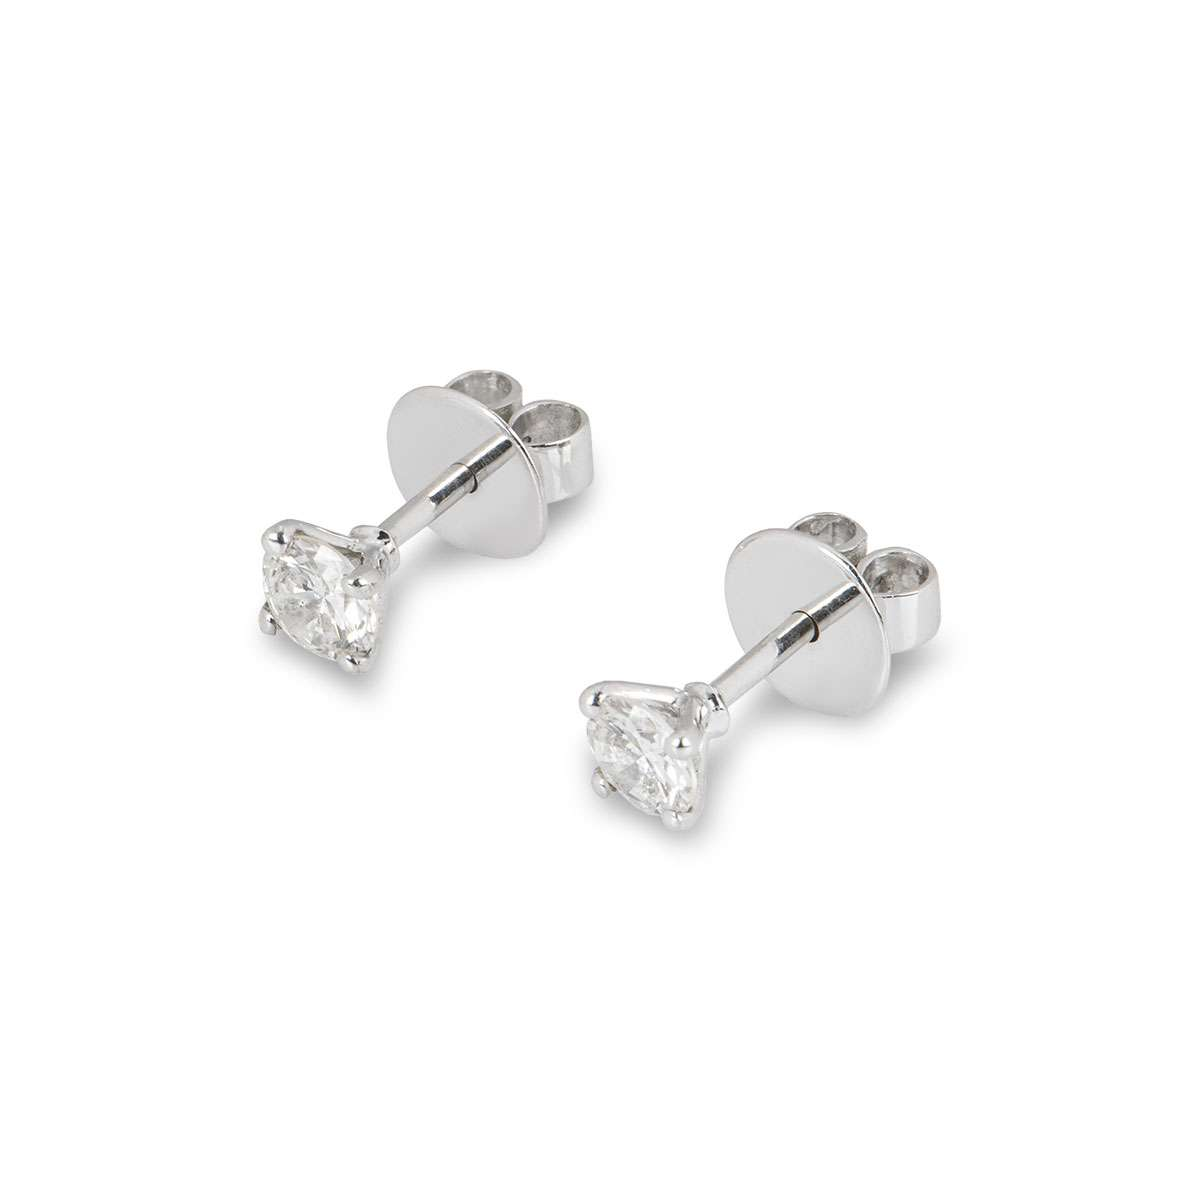 White Gold Round Brilliant Cut Diamond Earrings 0.60ct TDW